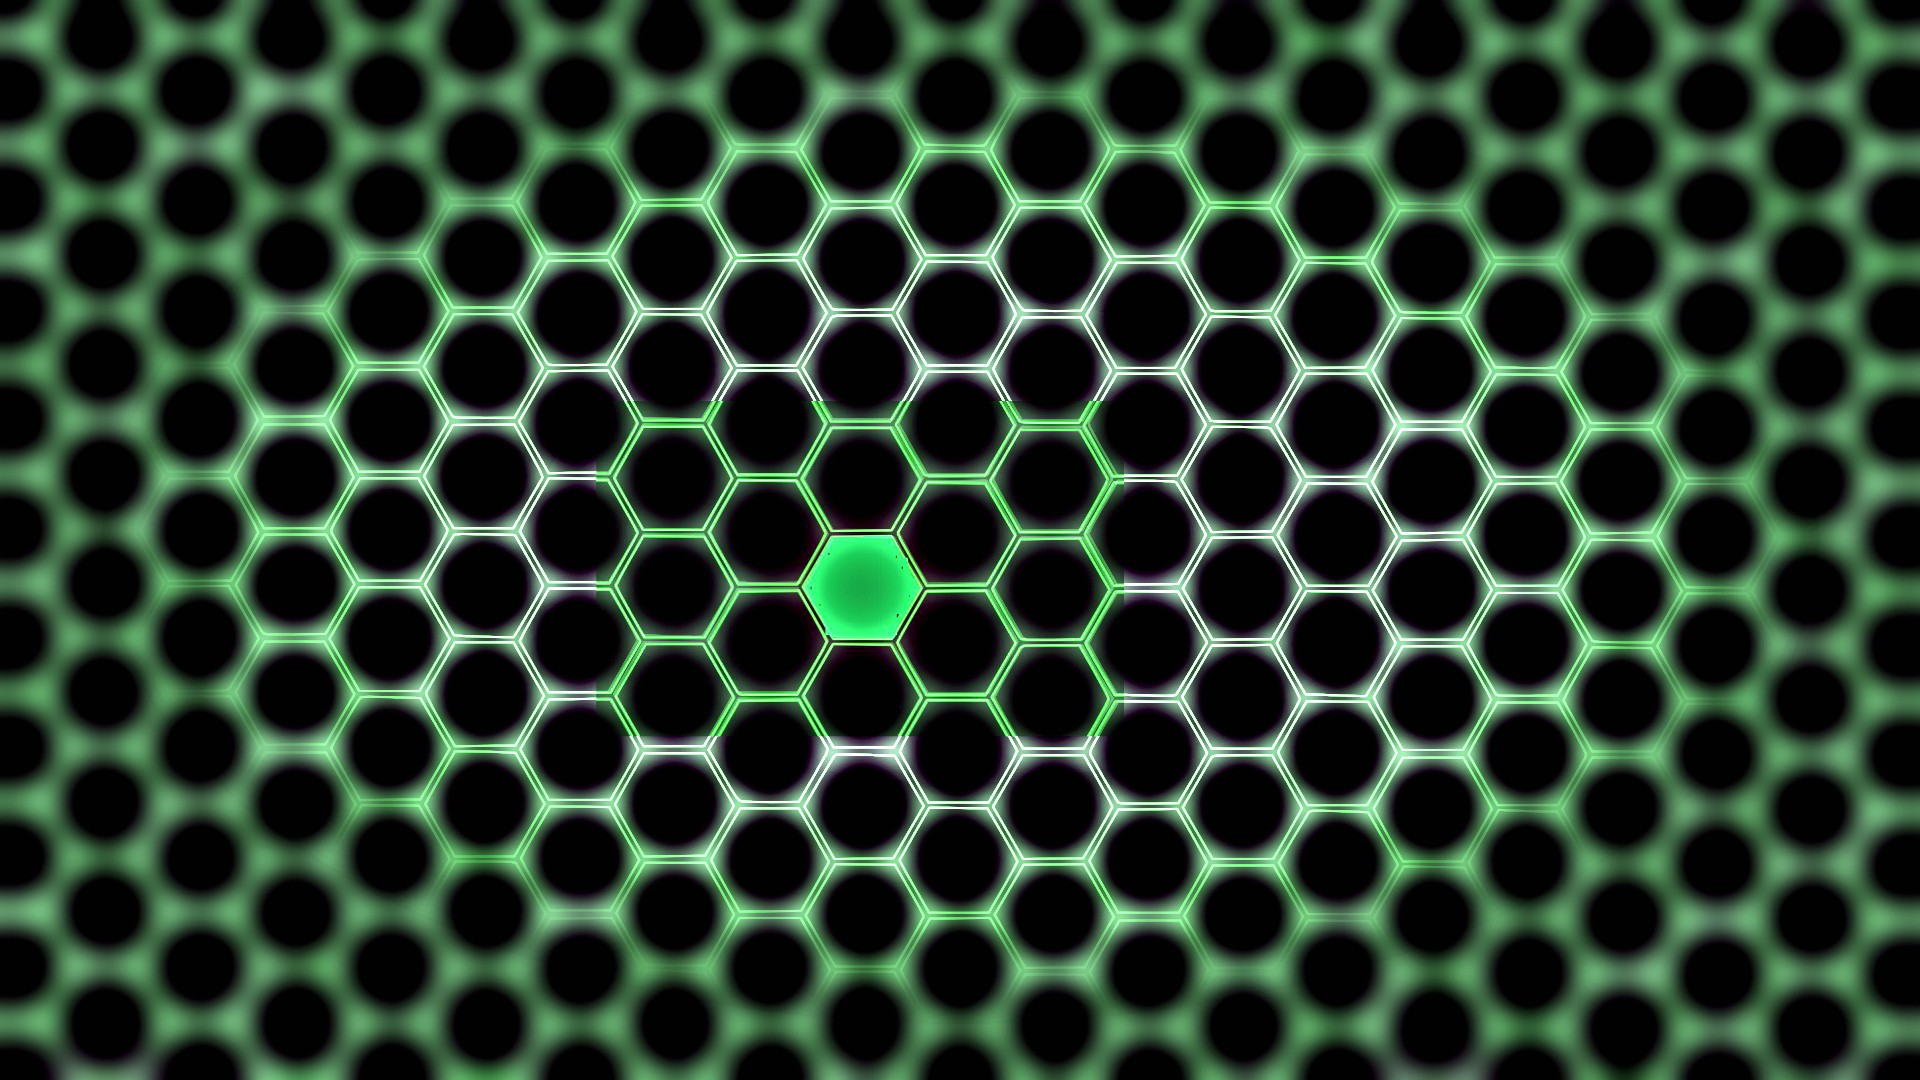 Scientists unleash graphene's innate superconductivity